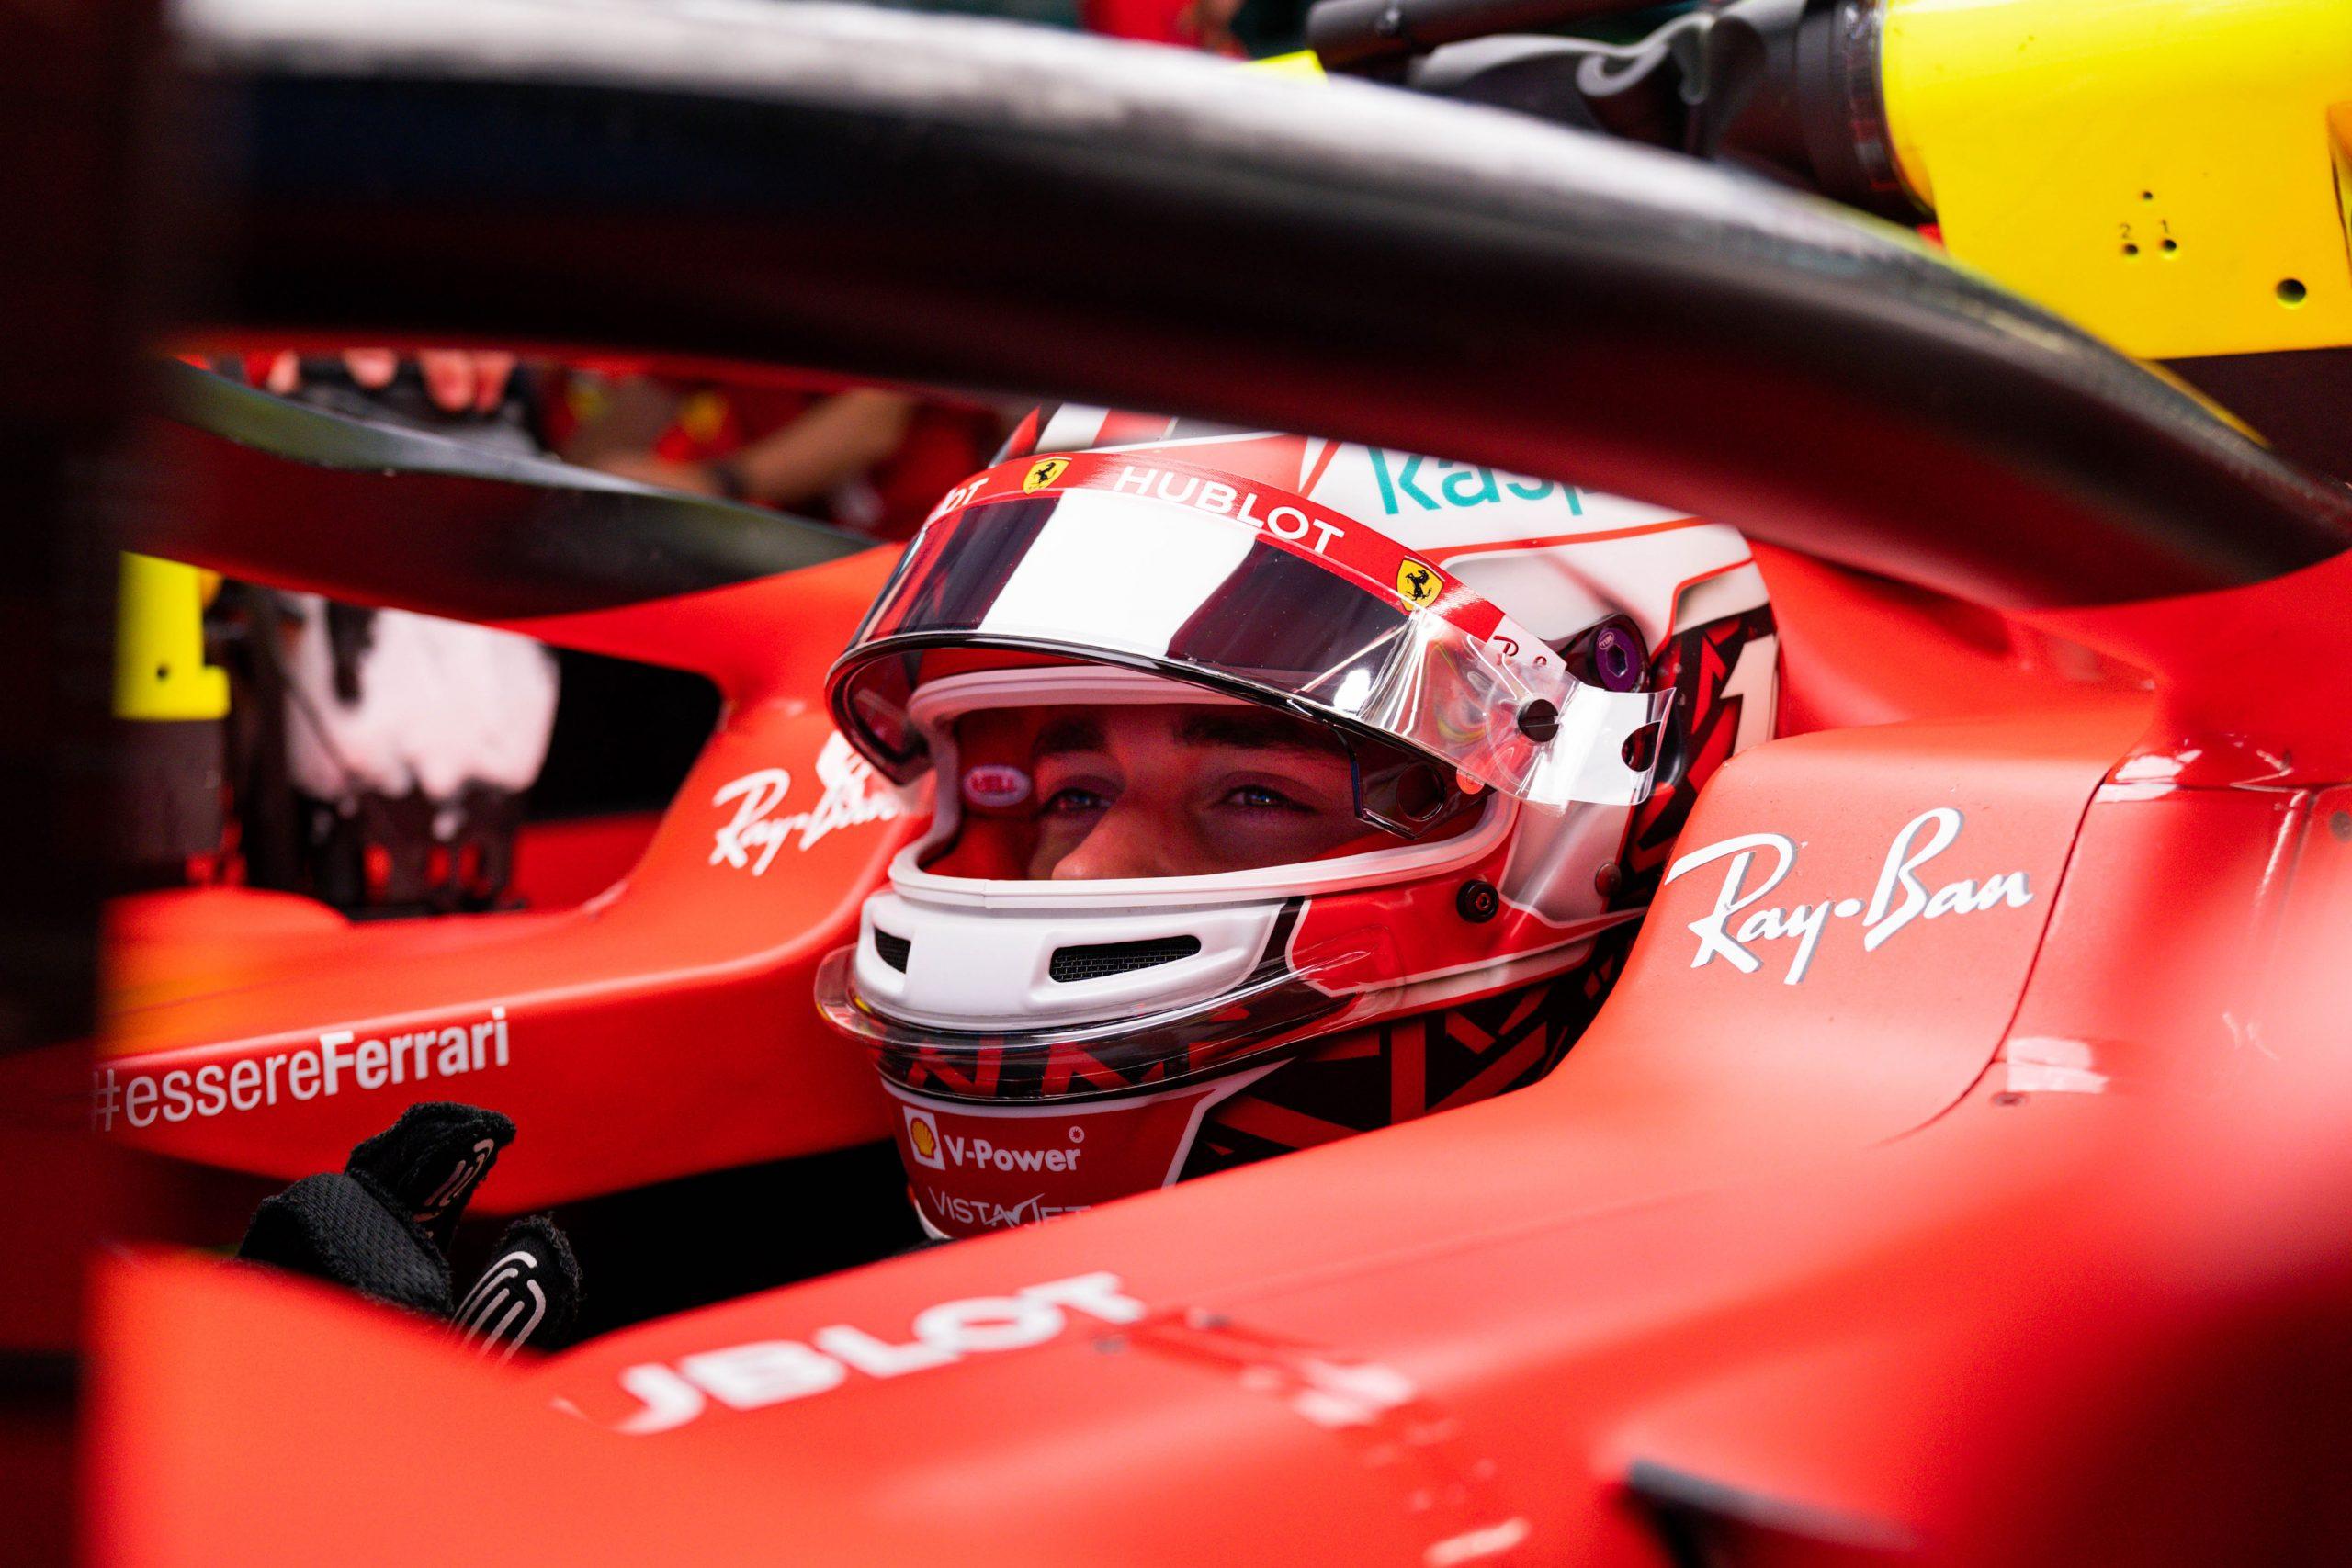 F1 Fan Grand Prix Blog For Real Gp Race Fans F1 Fansite Com